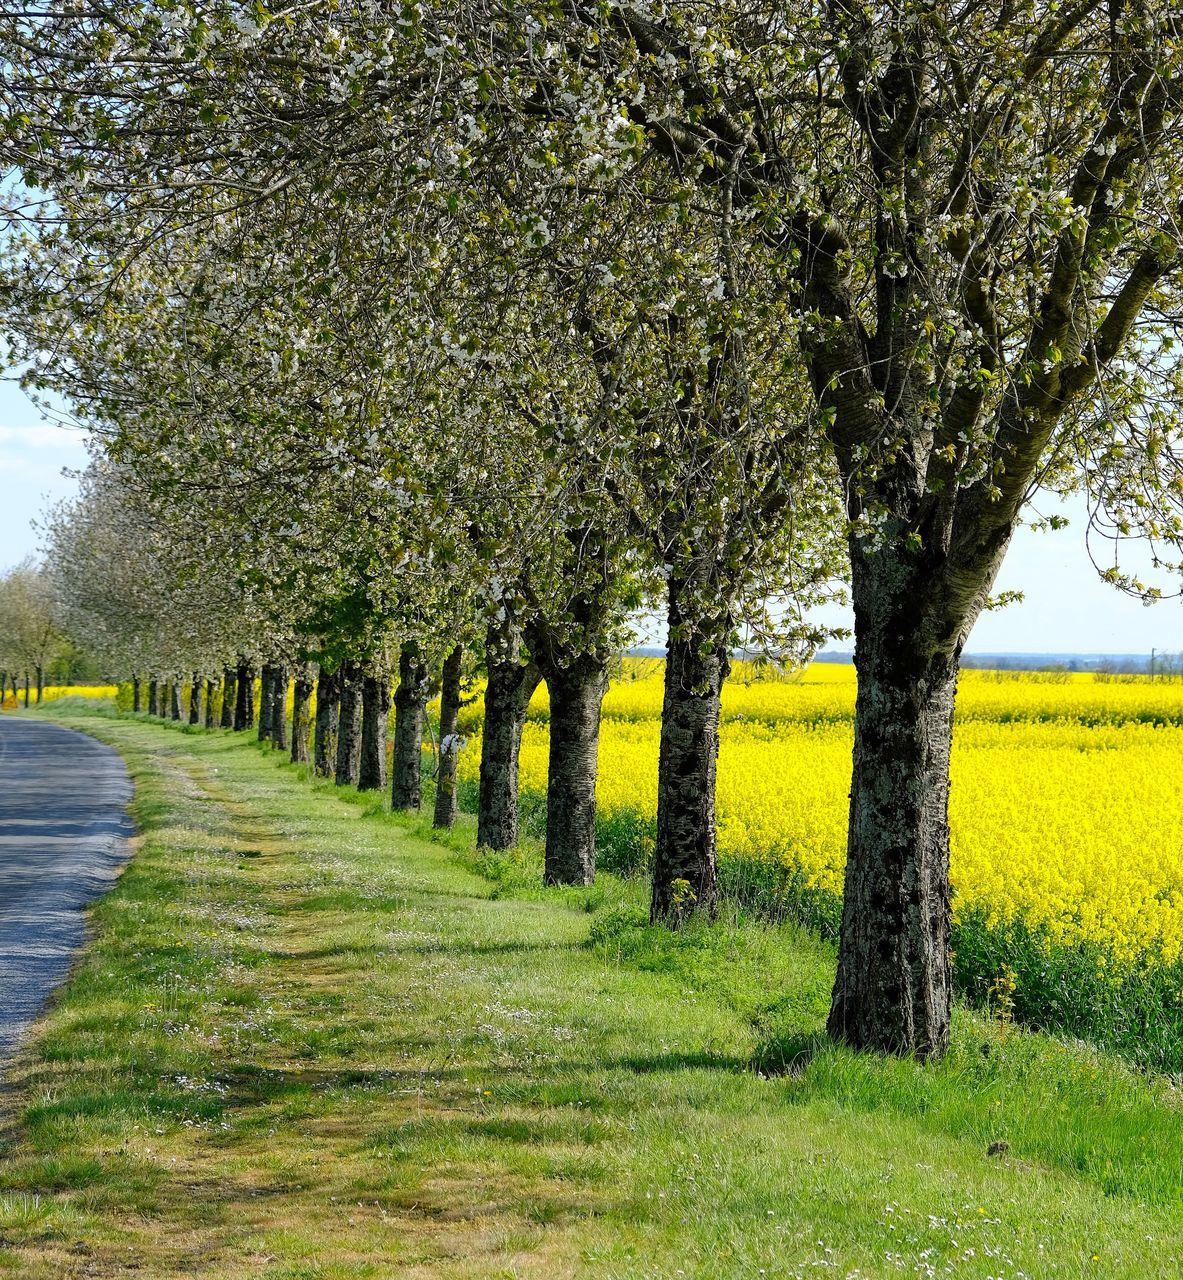 TREES ON FIELD BY PLANTS